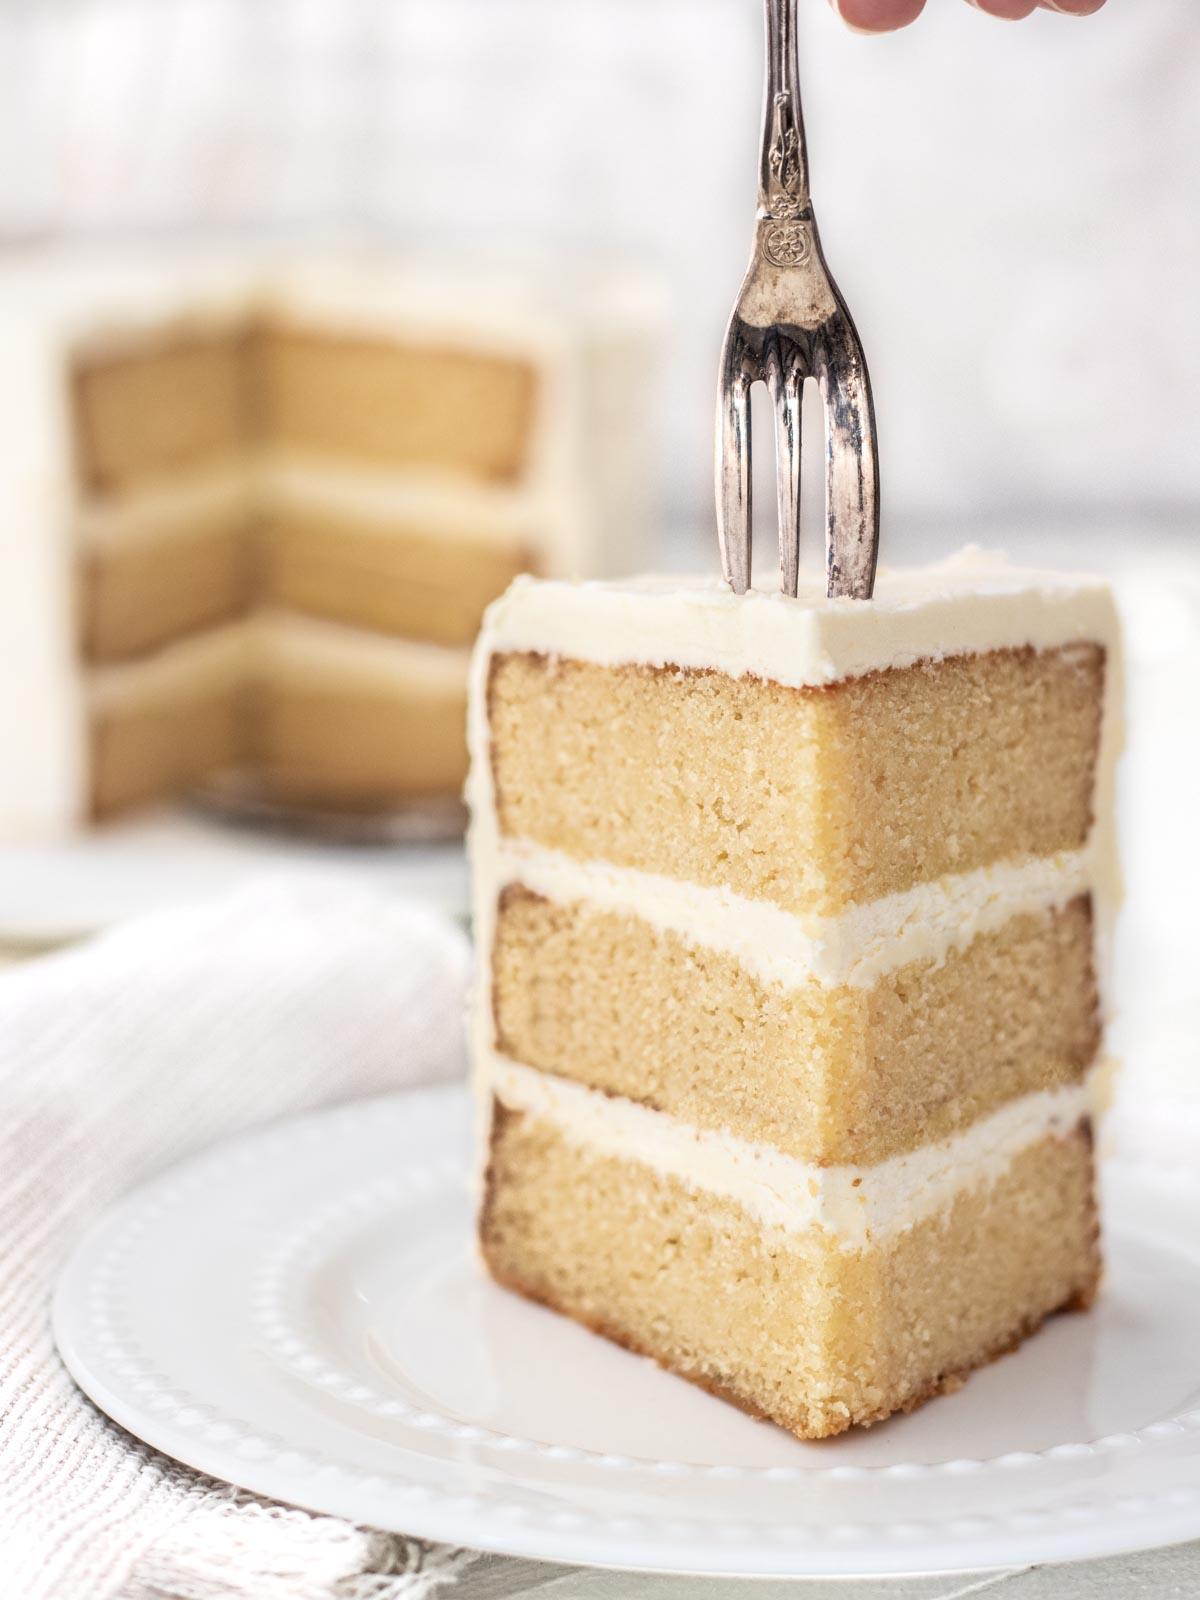 Slice of vanilla cake